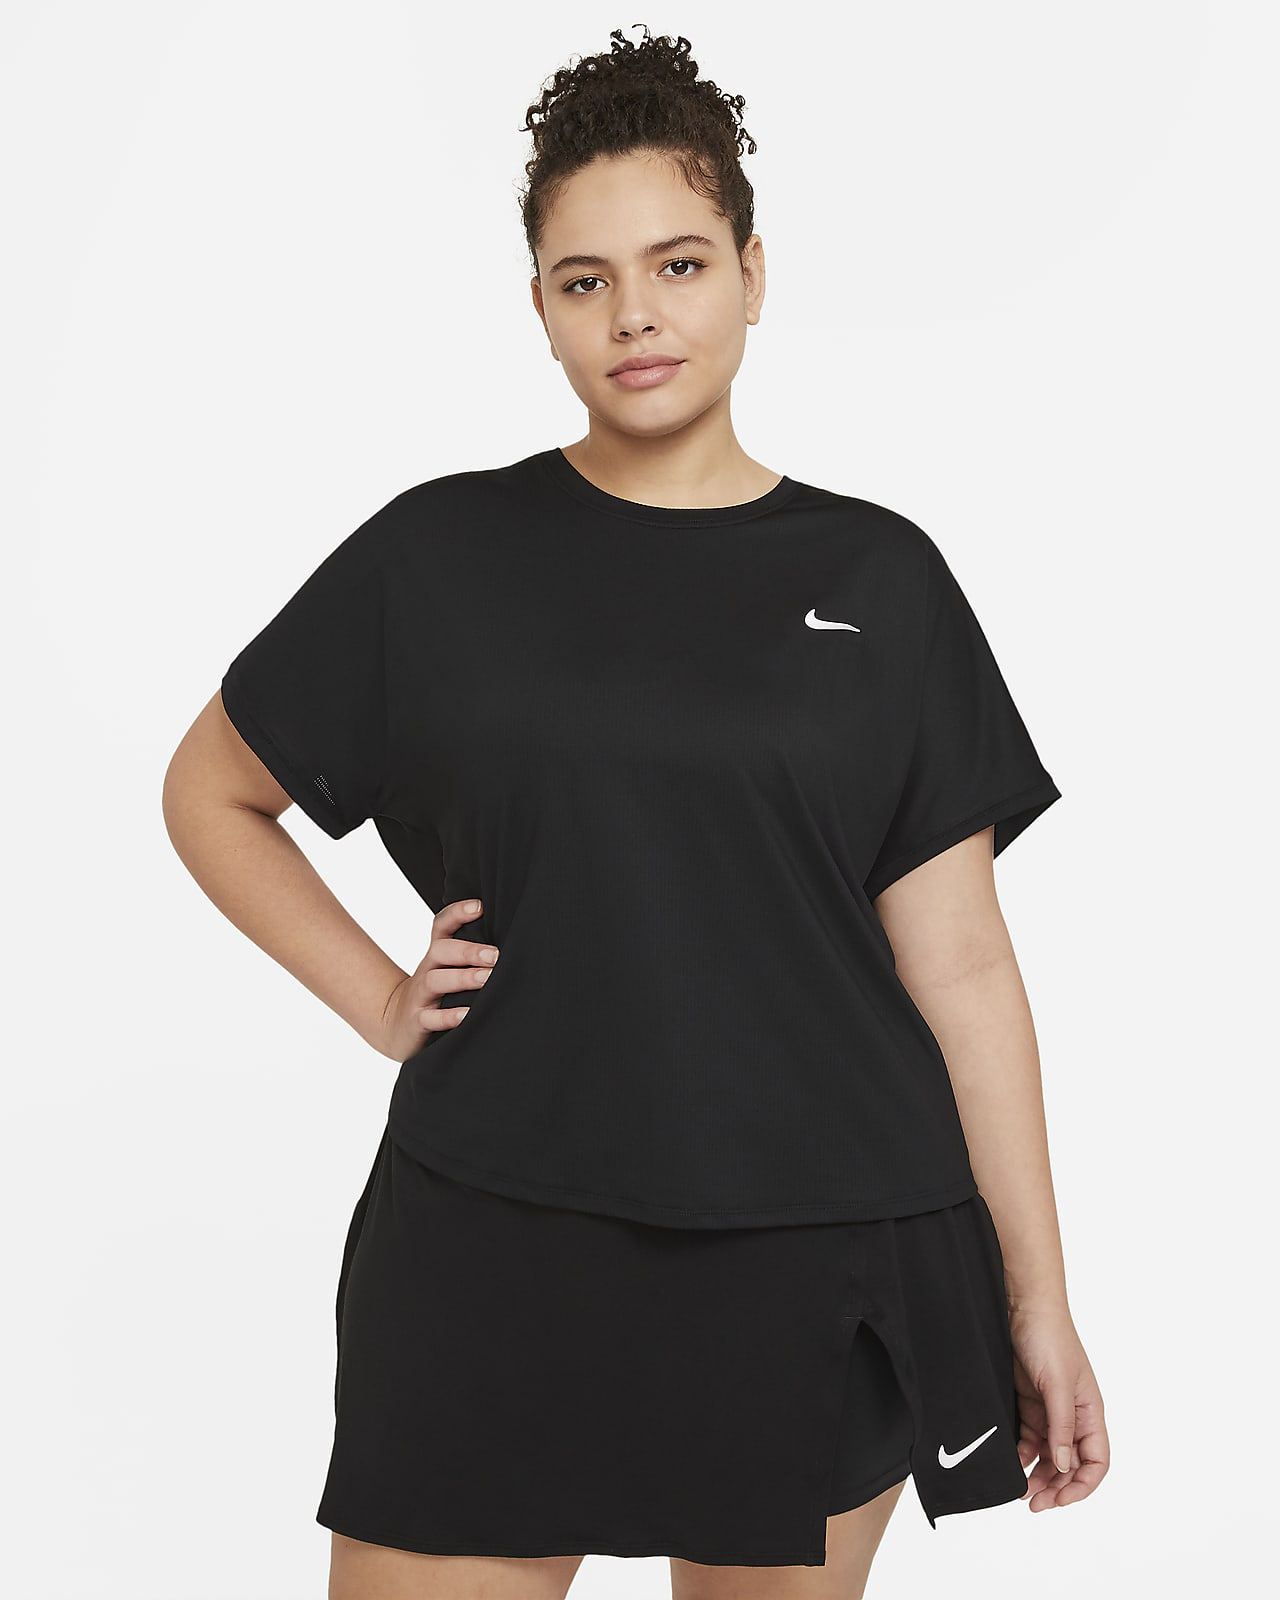 NikeCourt Dri-FIT Victory Women's Short-Sleeve Tennis Top (Plus Size)